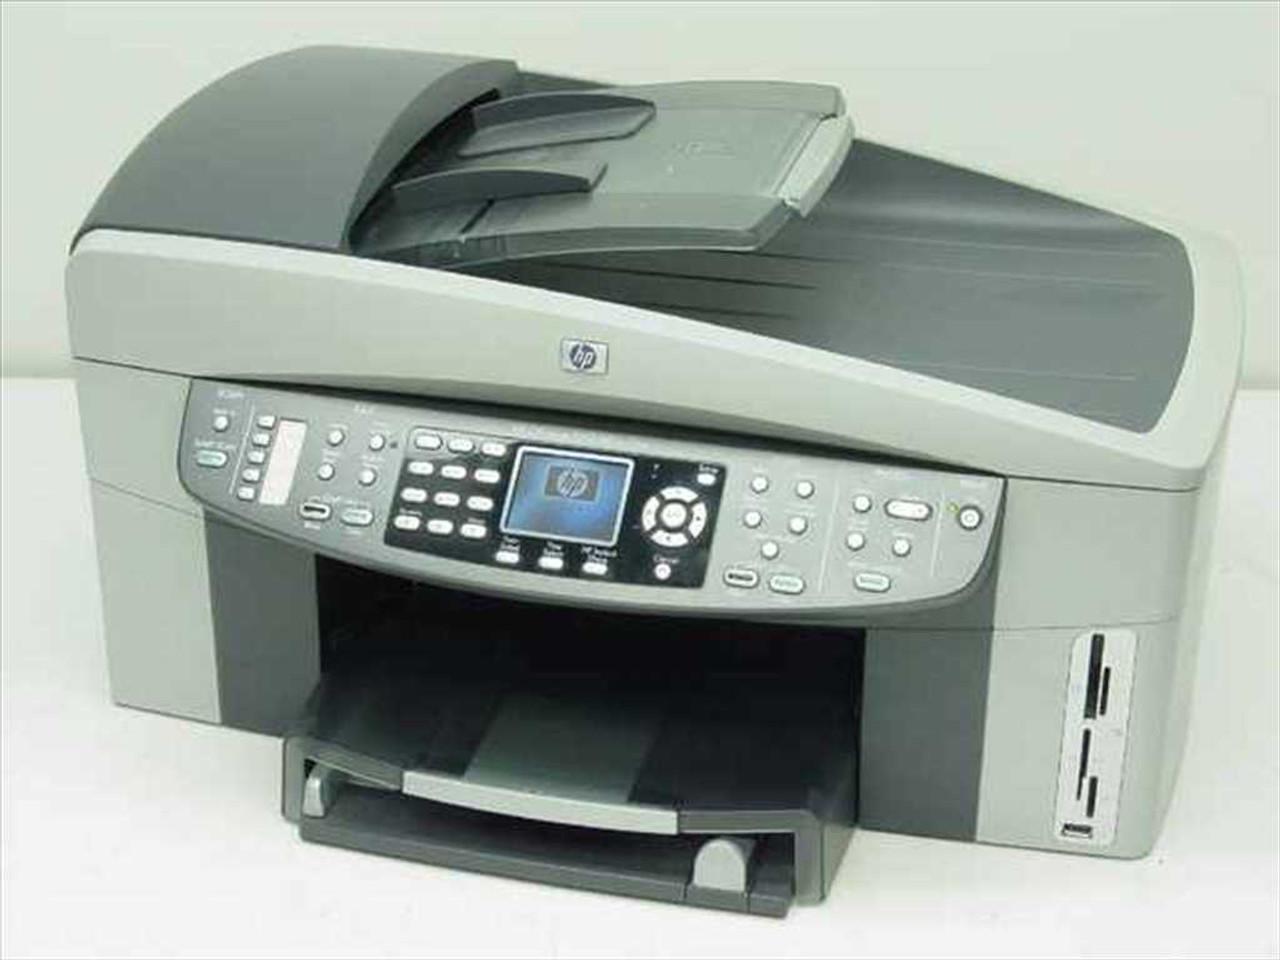 hewlett packard q3461a hp officejet 7310 all in one printer scanner rh recycledgoods com HP Officejet 7410 HP Officejet 6200